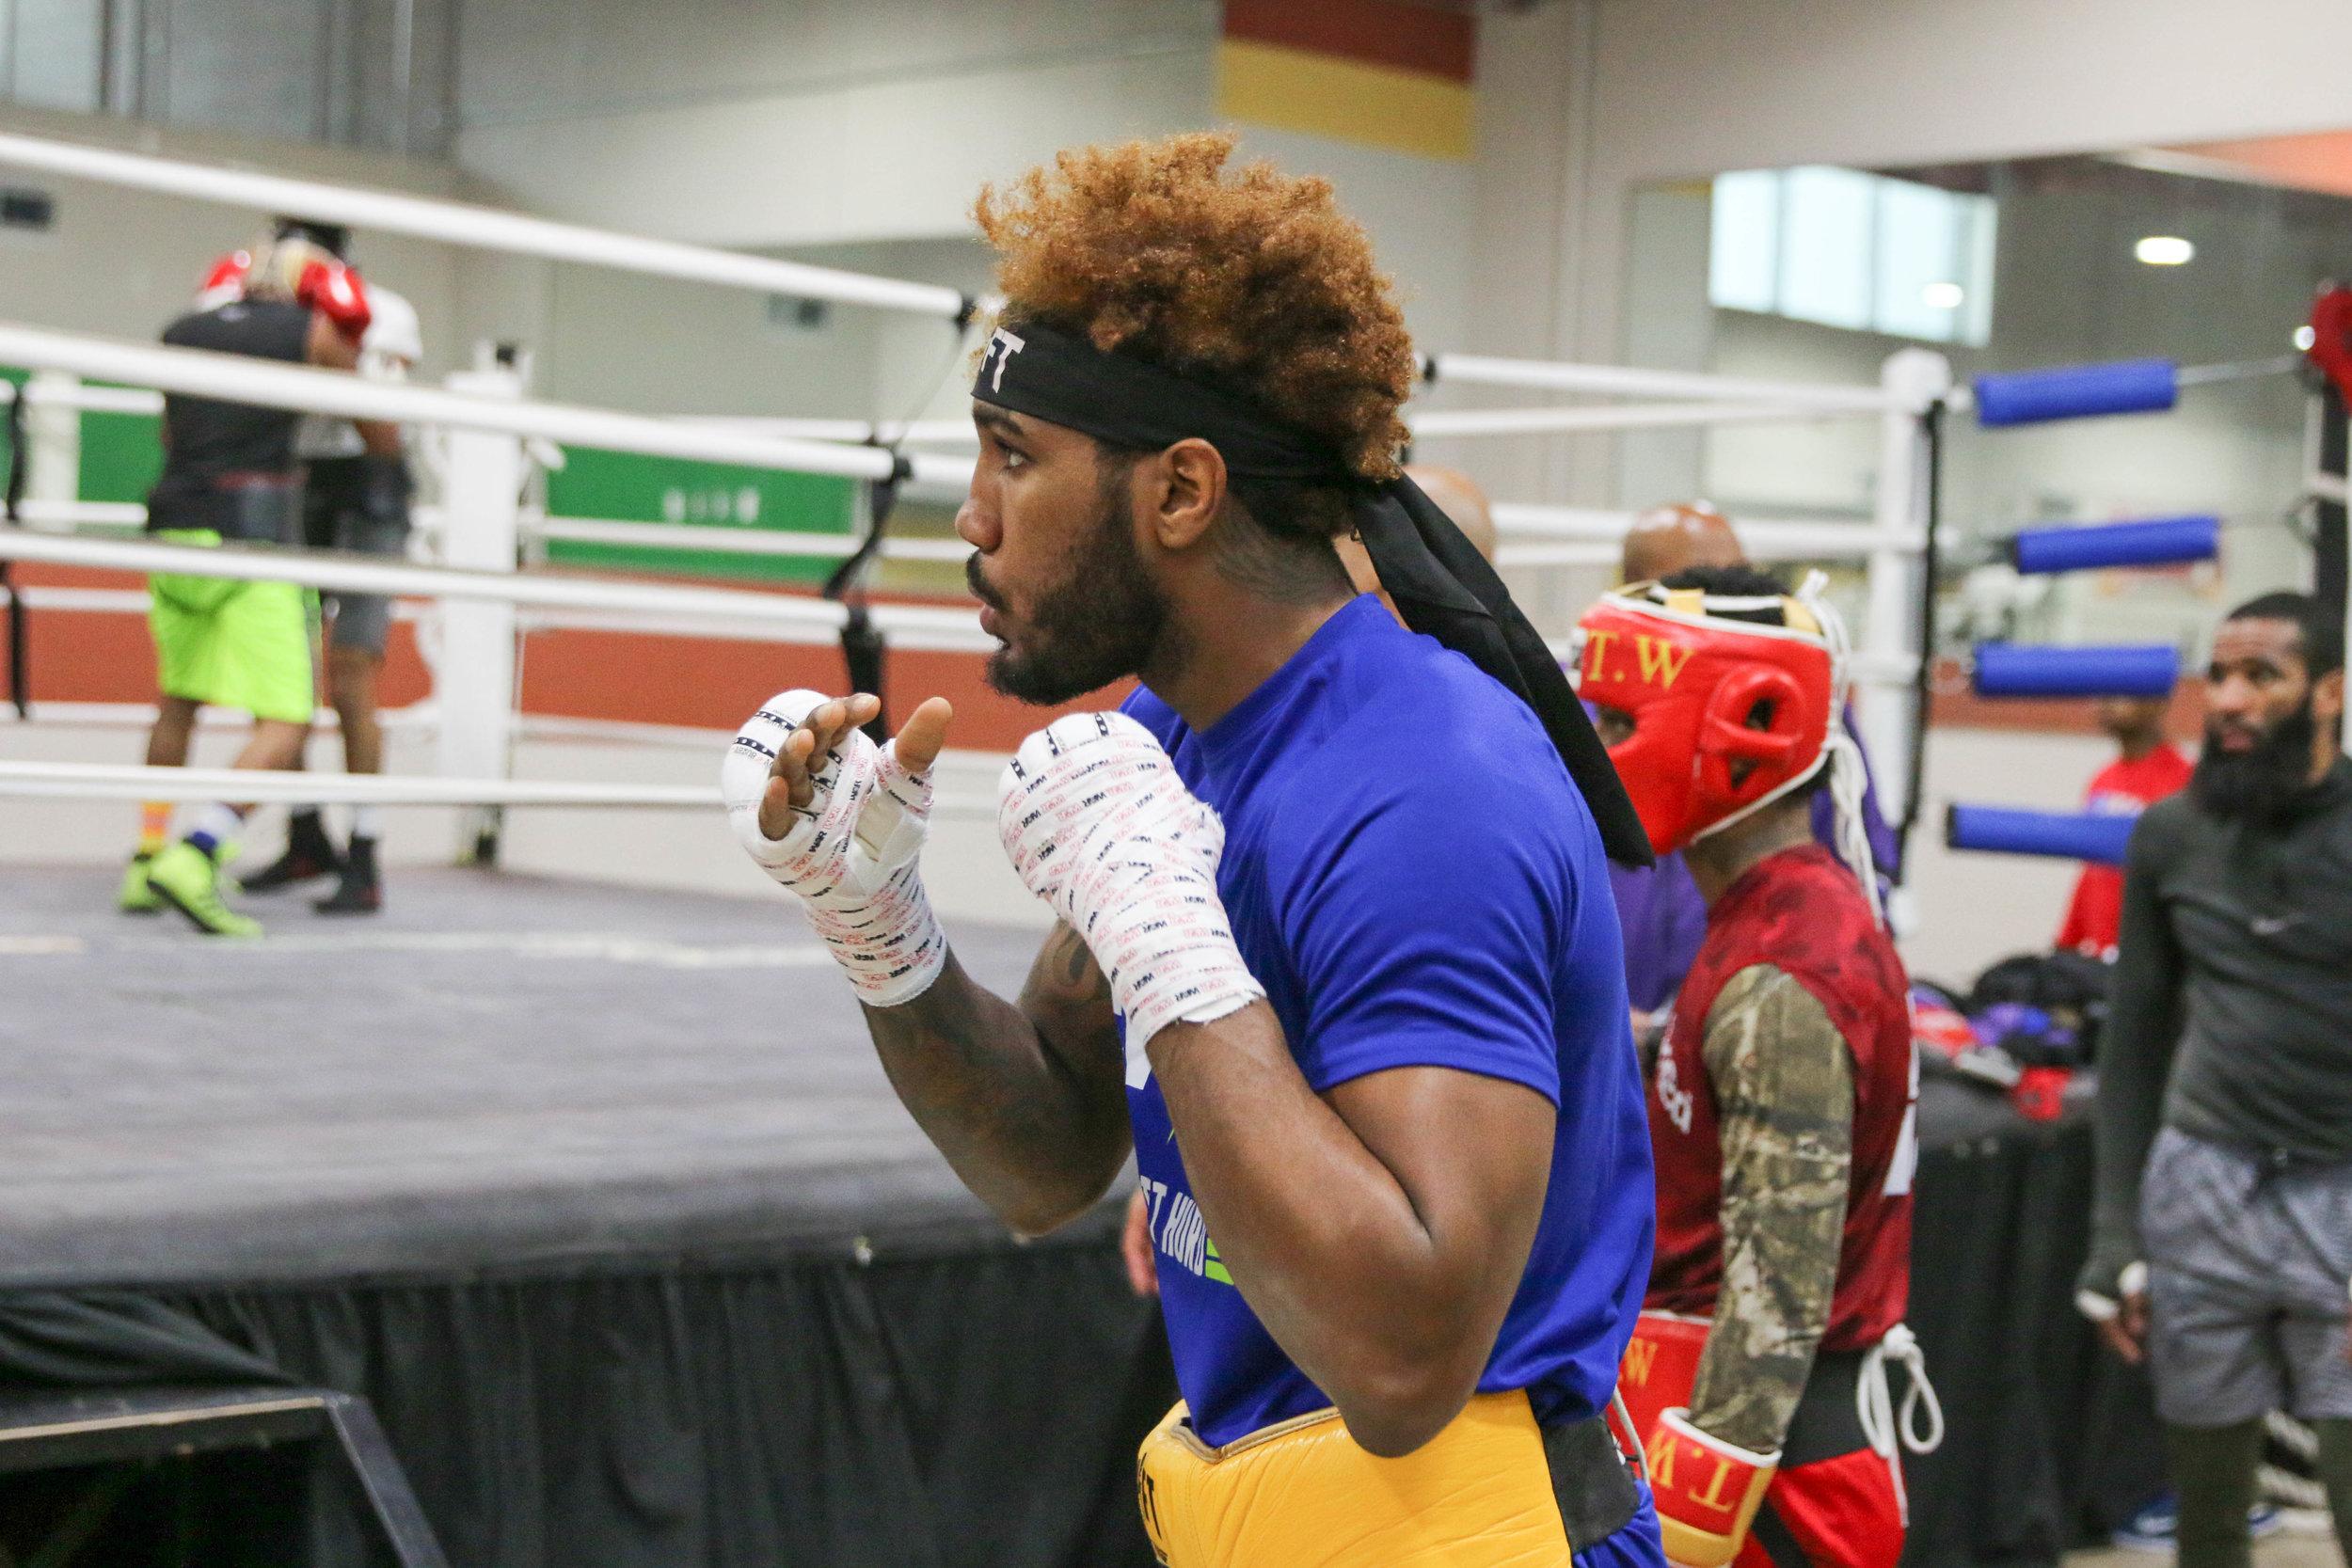 Jarrett Hurd Camp Visit_02_25_2017_Workout_Leo Wilson Jr. _ Premier Boxing Champions1.jpg